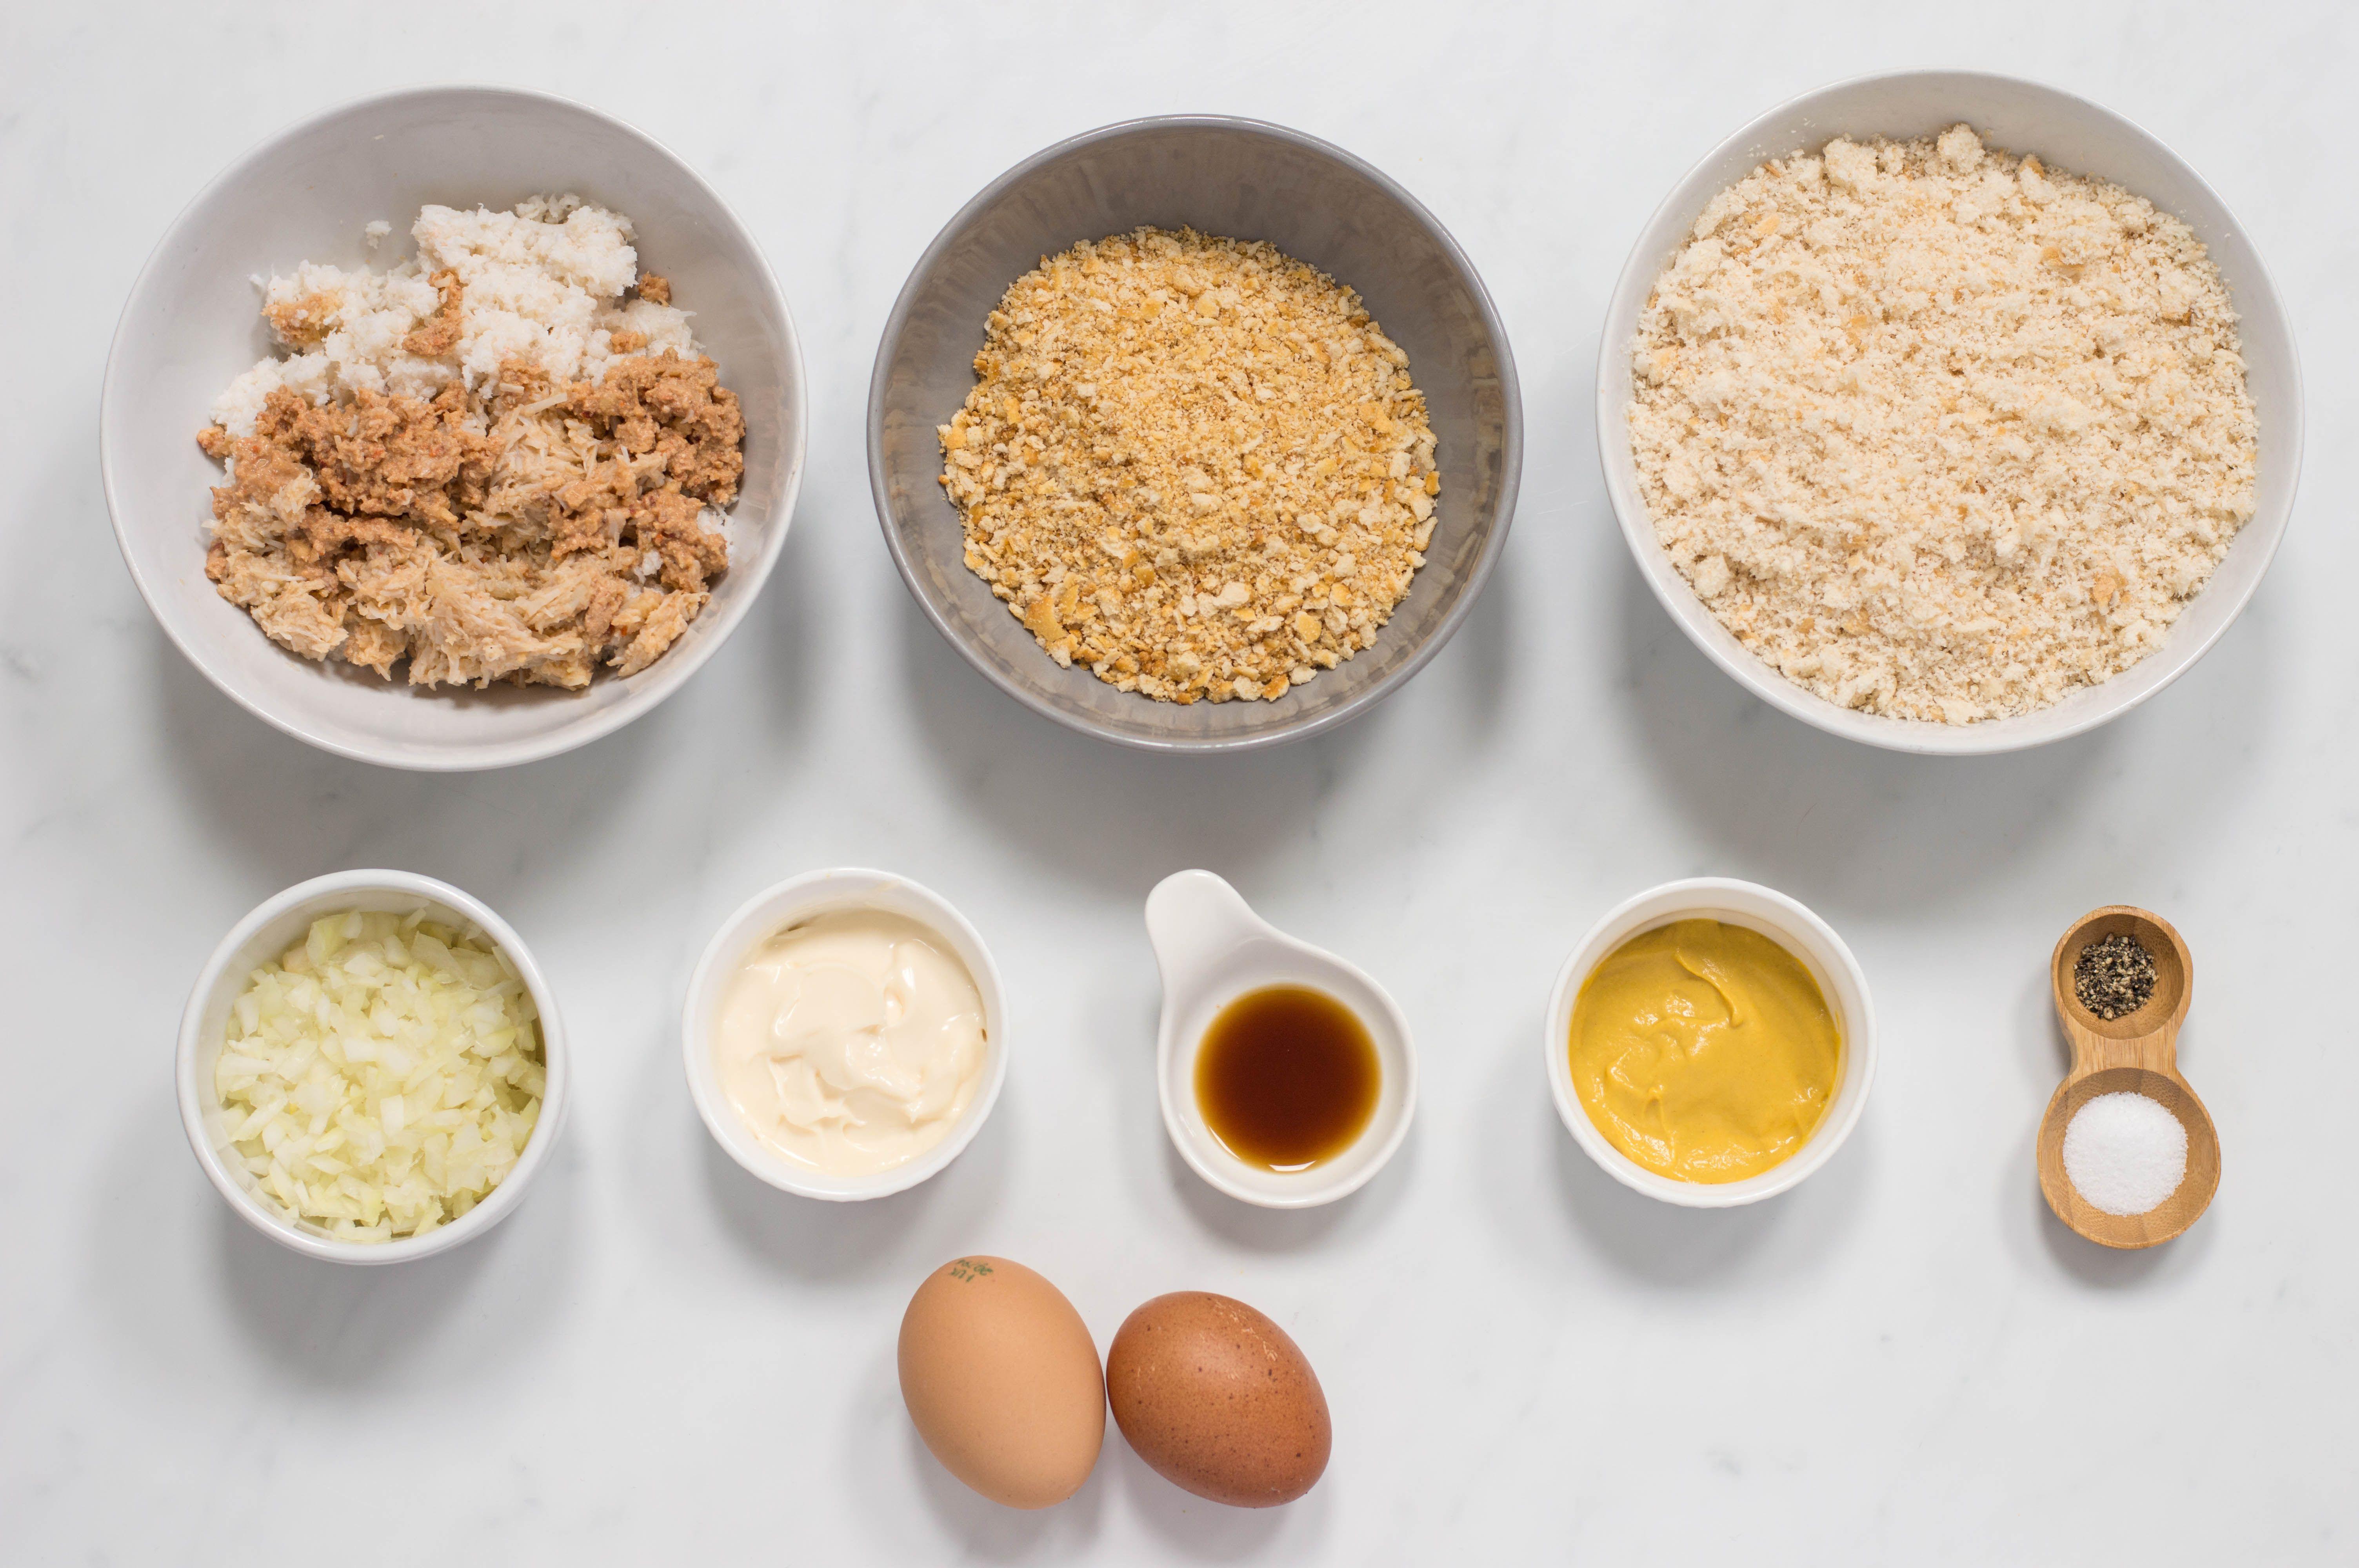 Ingredients for crab balls